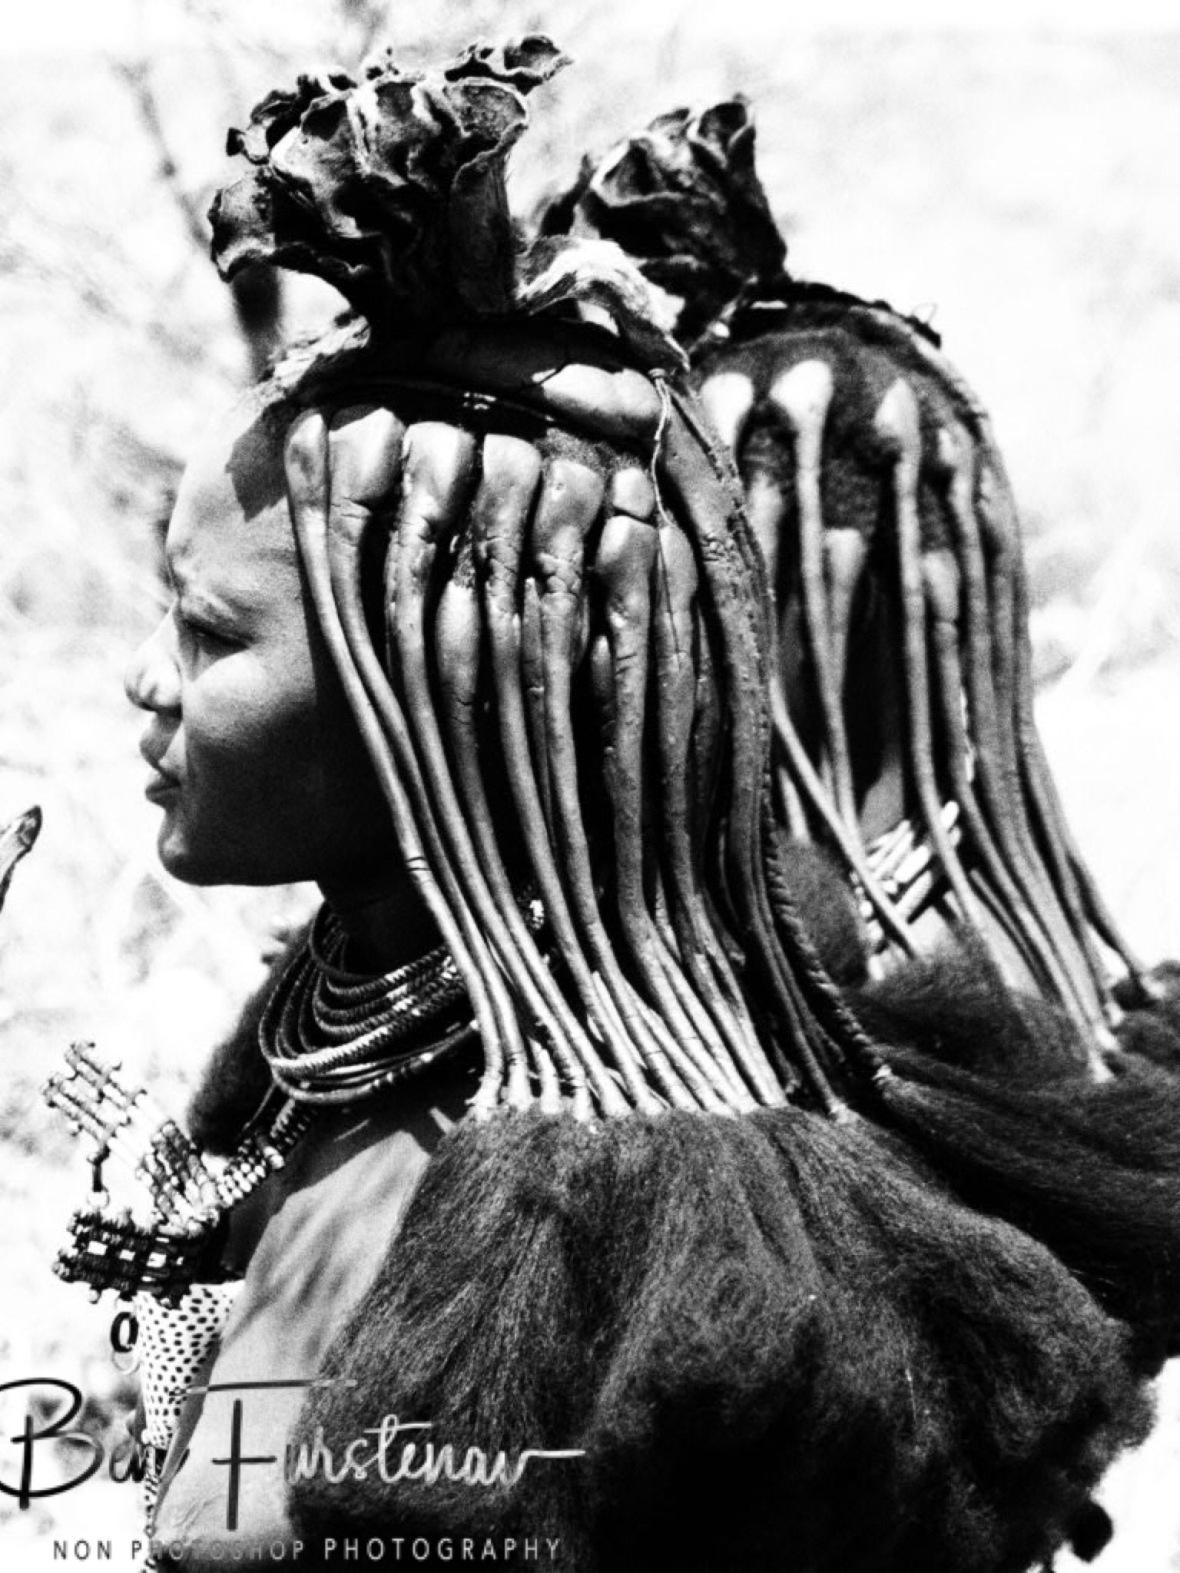 Worrier look?, Omusaona Himba Village, Kamanjab, Namibia